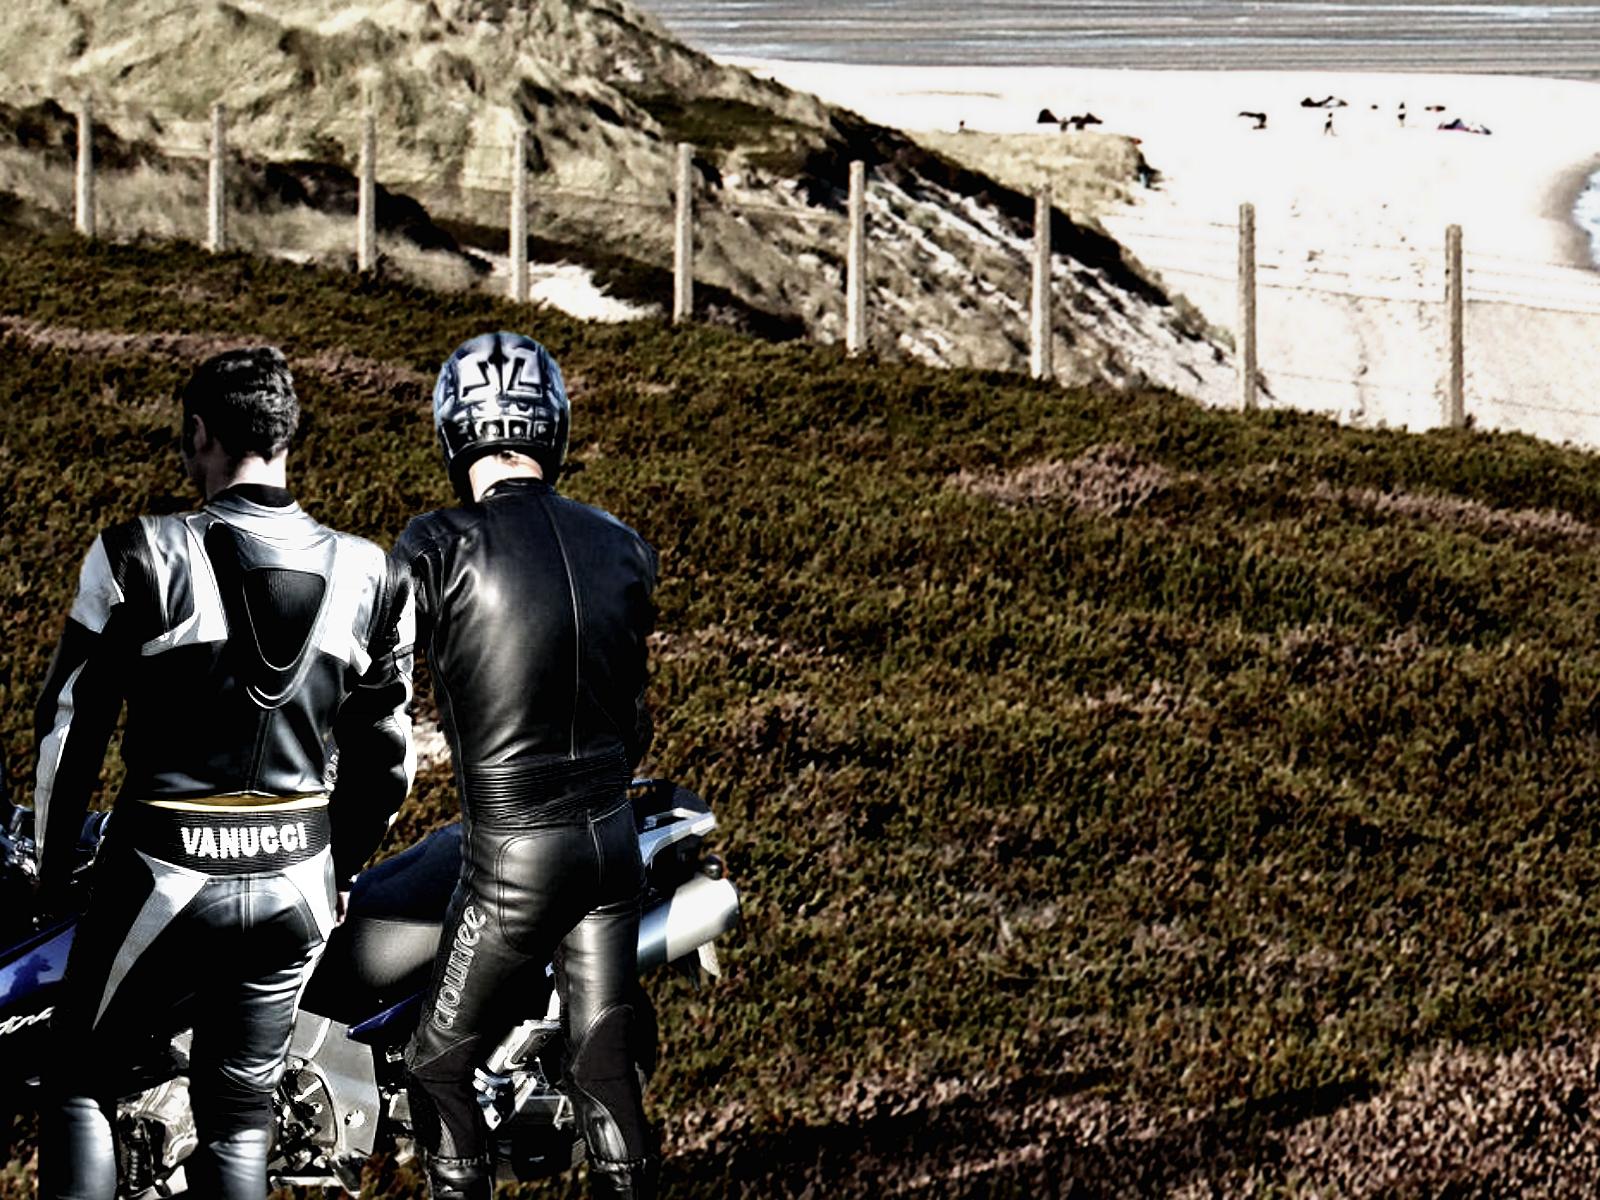 finest selection 45aaa 938fc Hintergrundbilder : Stadt, Fahrrad, Gras, Motorrad, Fahrzeug ...